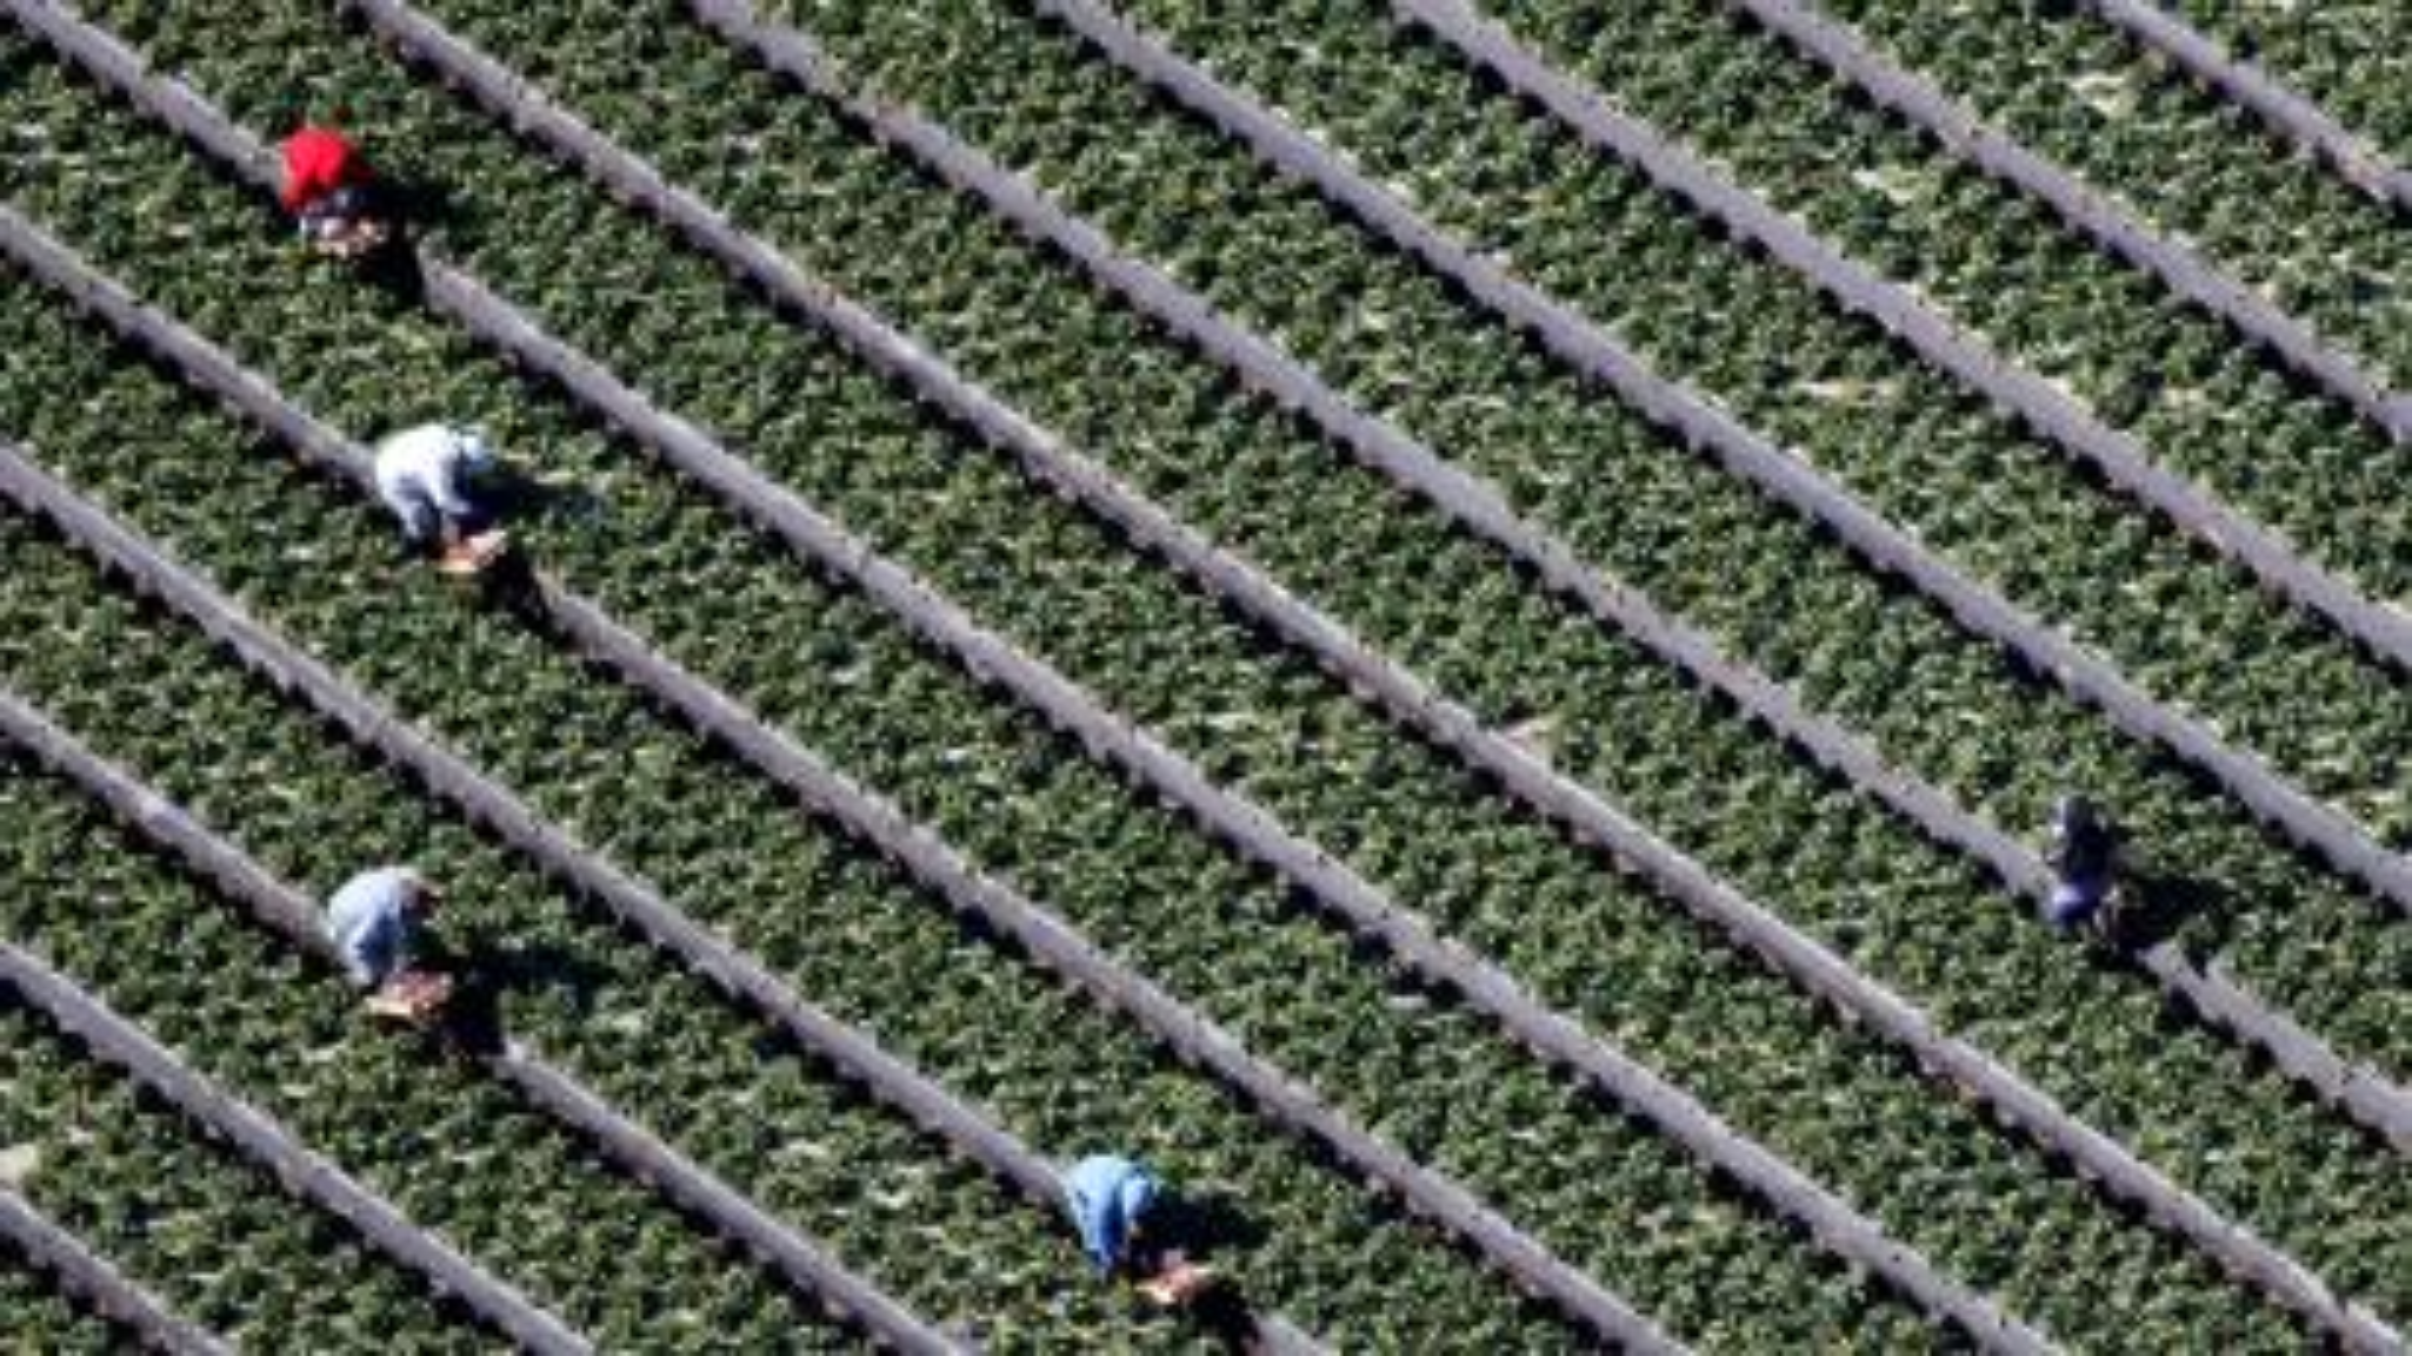 Workers pick strawberries in a field on a farm in Oxnard